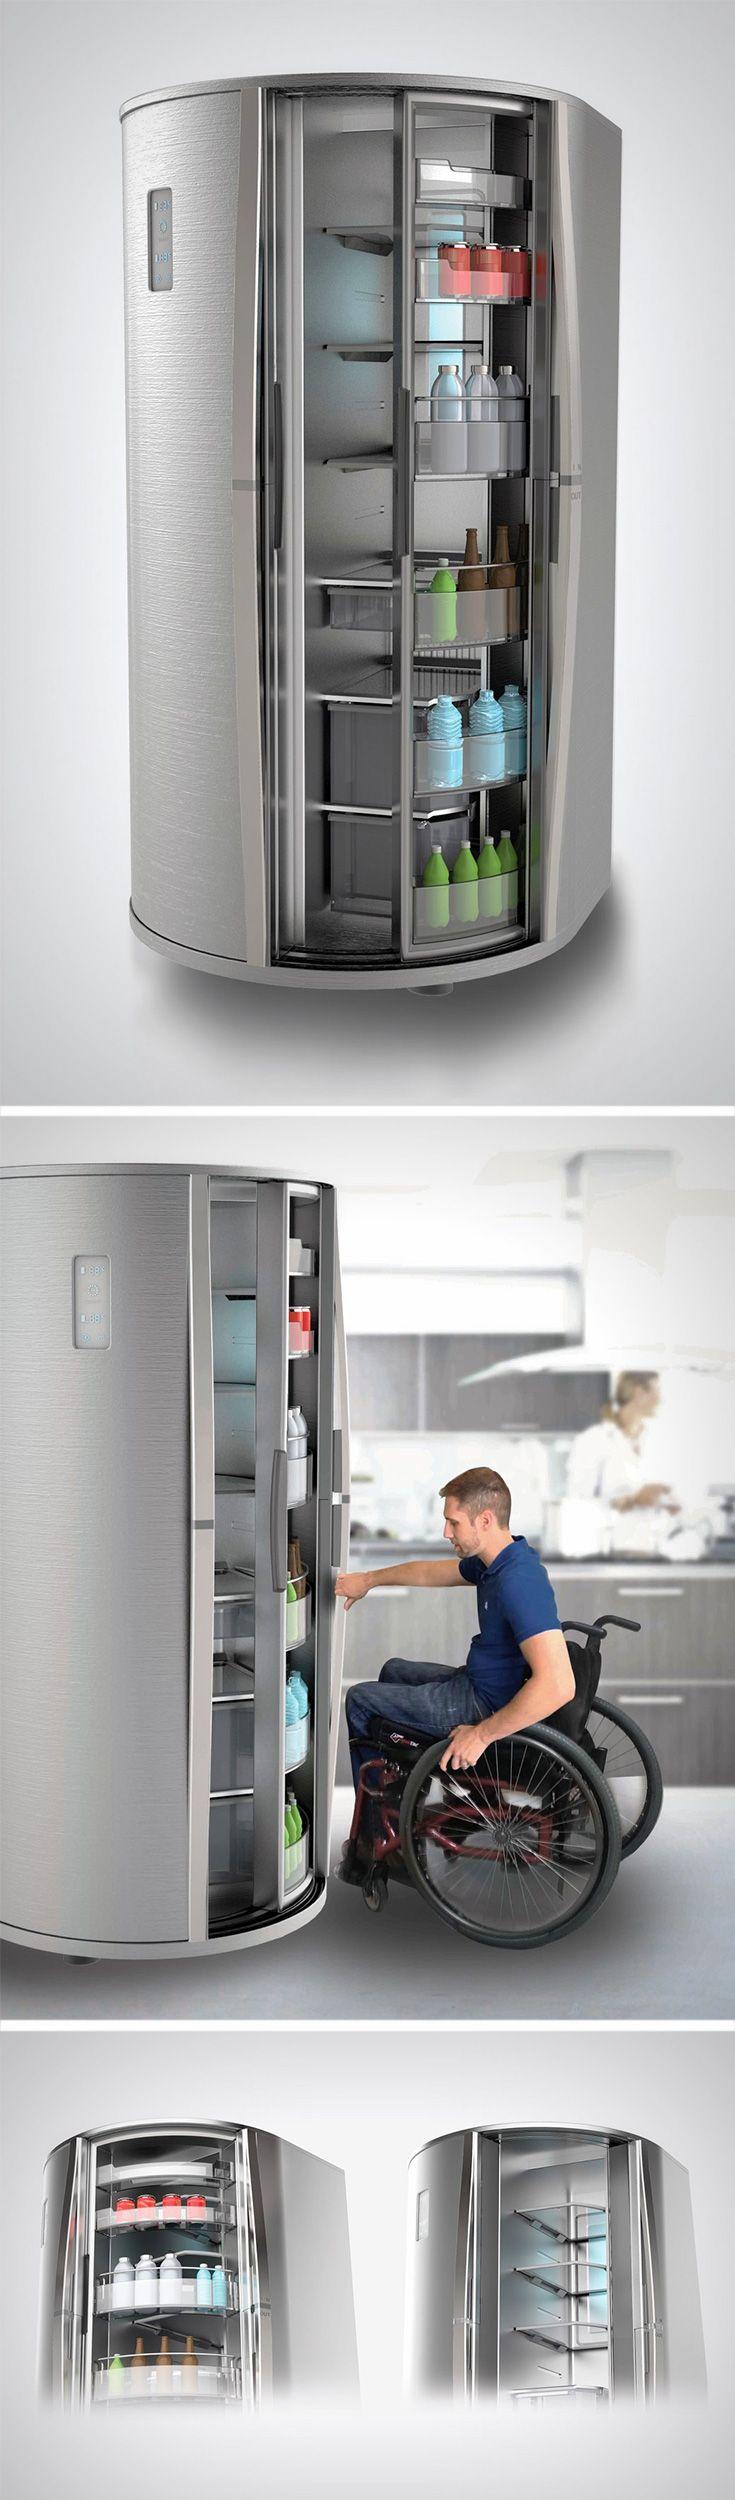 The Sliding Fridge is one such idea that makes a much needed change to the way we interact with fridge doors. //새로운 형태의 냉장고 참신하고 이런 형태가 왜 시중이 나오지 못했는지 생각을 하게 한다.